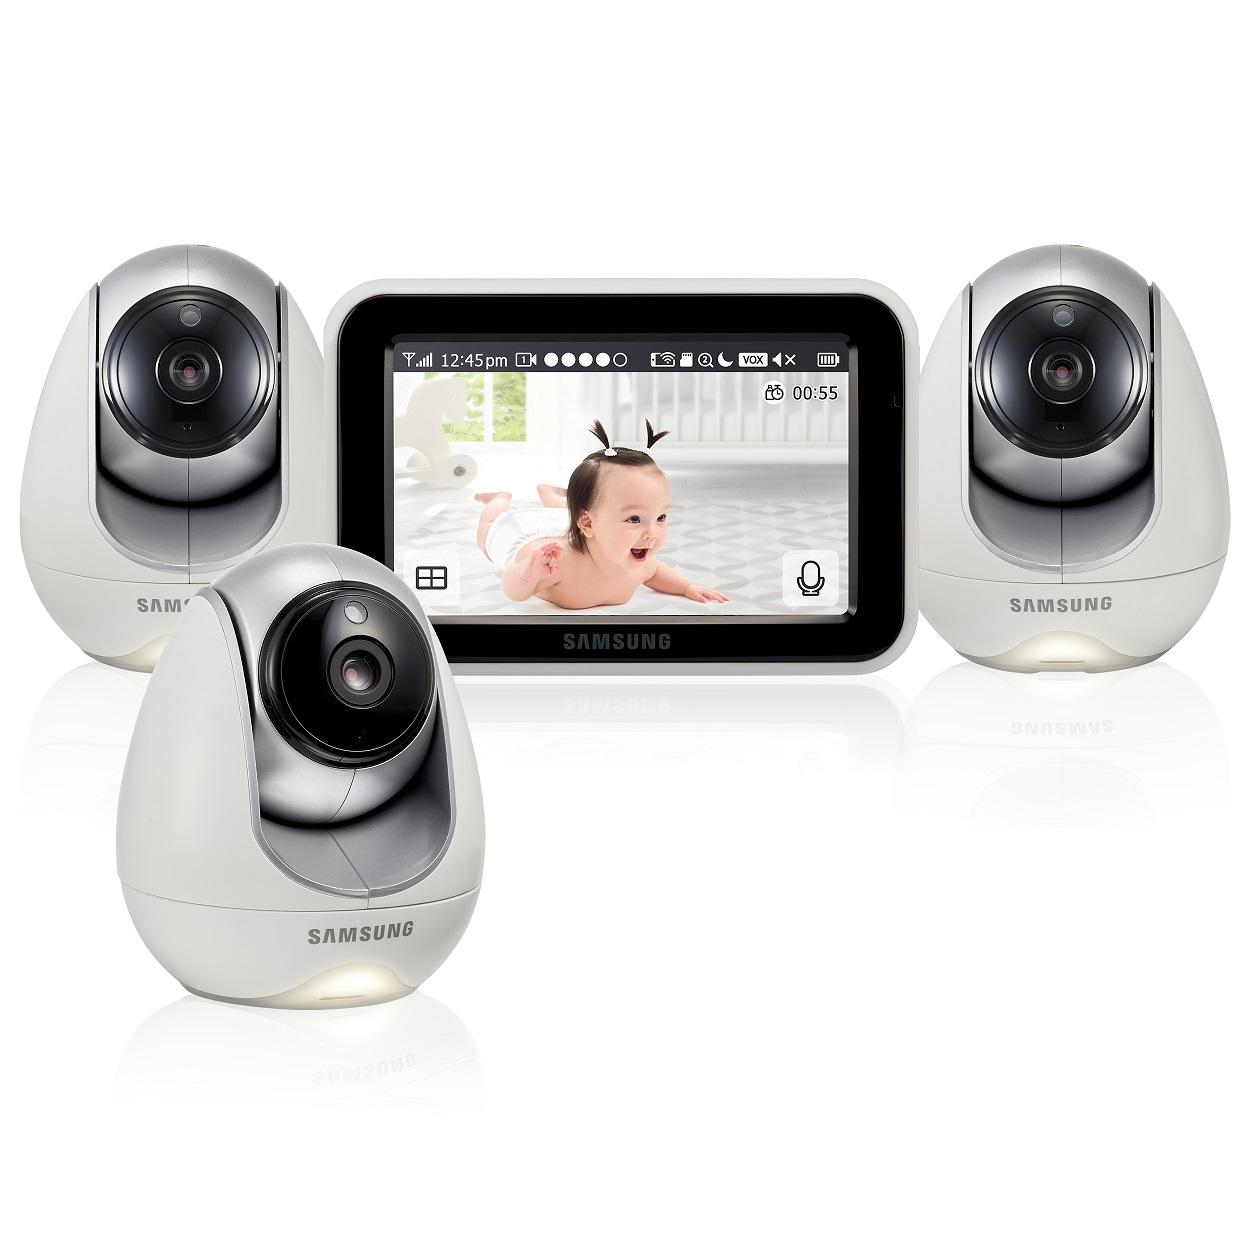 Купить Видеоняня Samsung SEW-3053WPX3 с 3 камерами